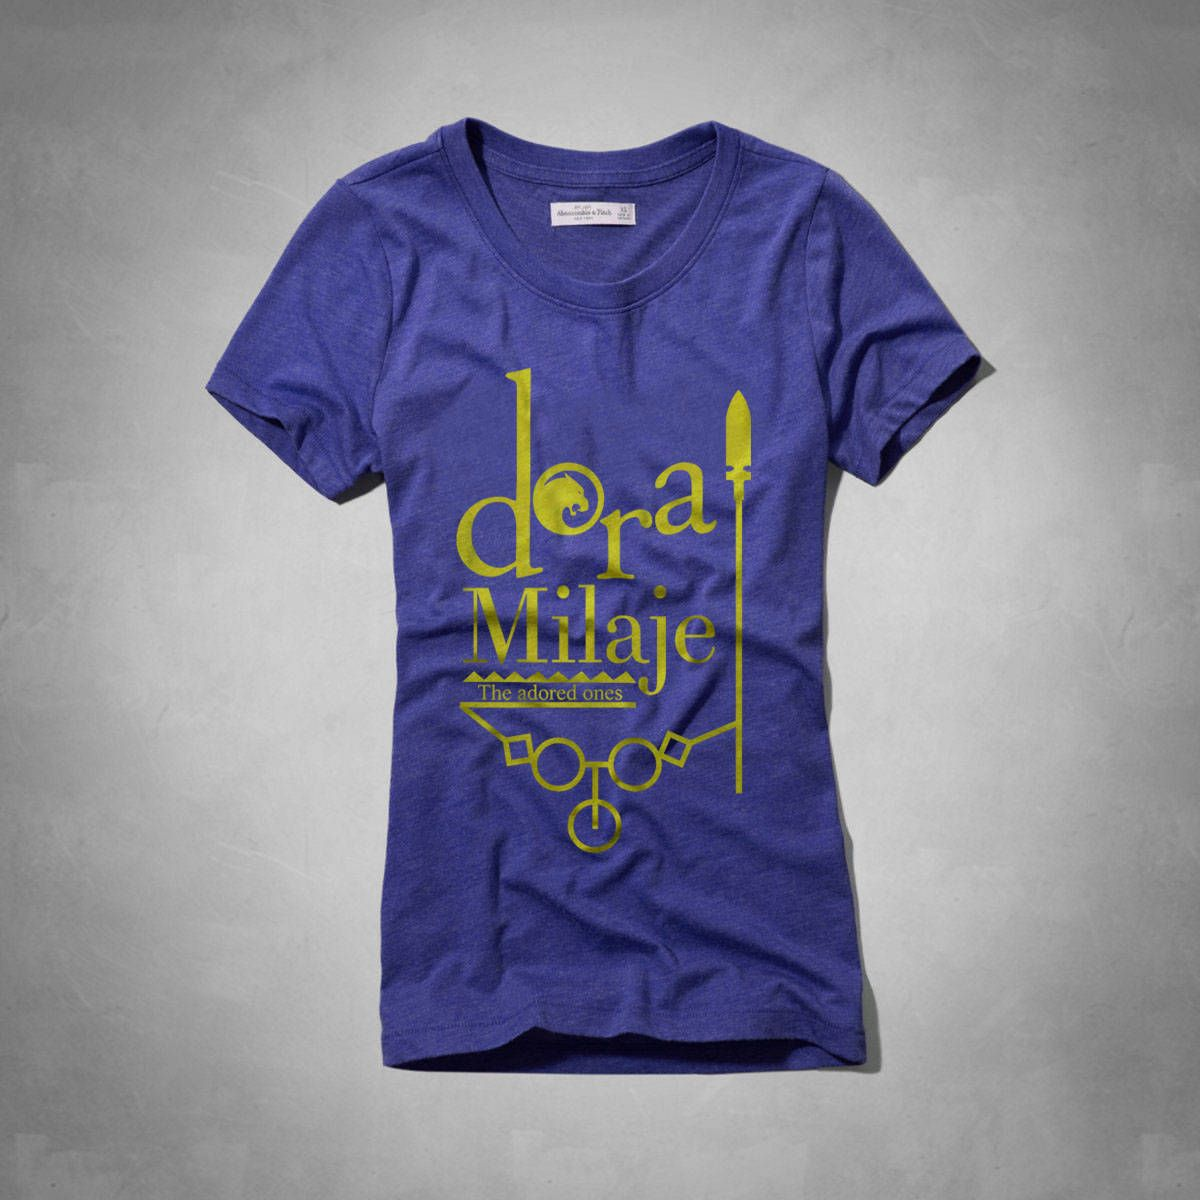 36d6ff7c034da Dora Milaje - Black Panther ADULT T-shirt | tees | Black panther, T ...